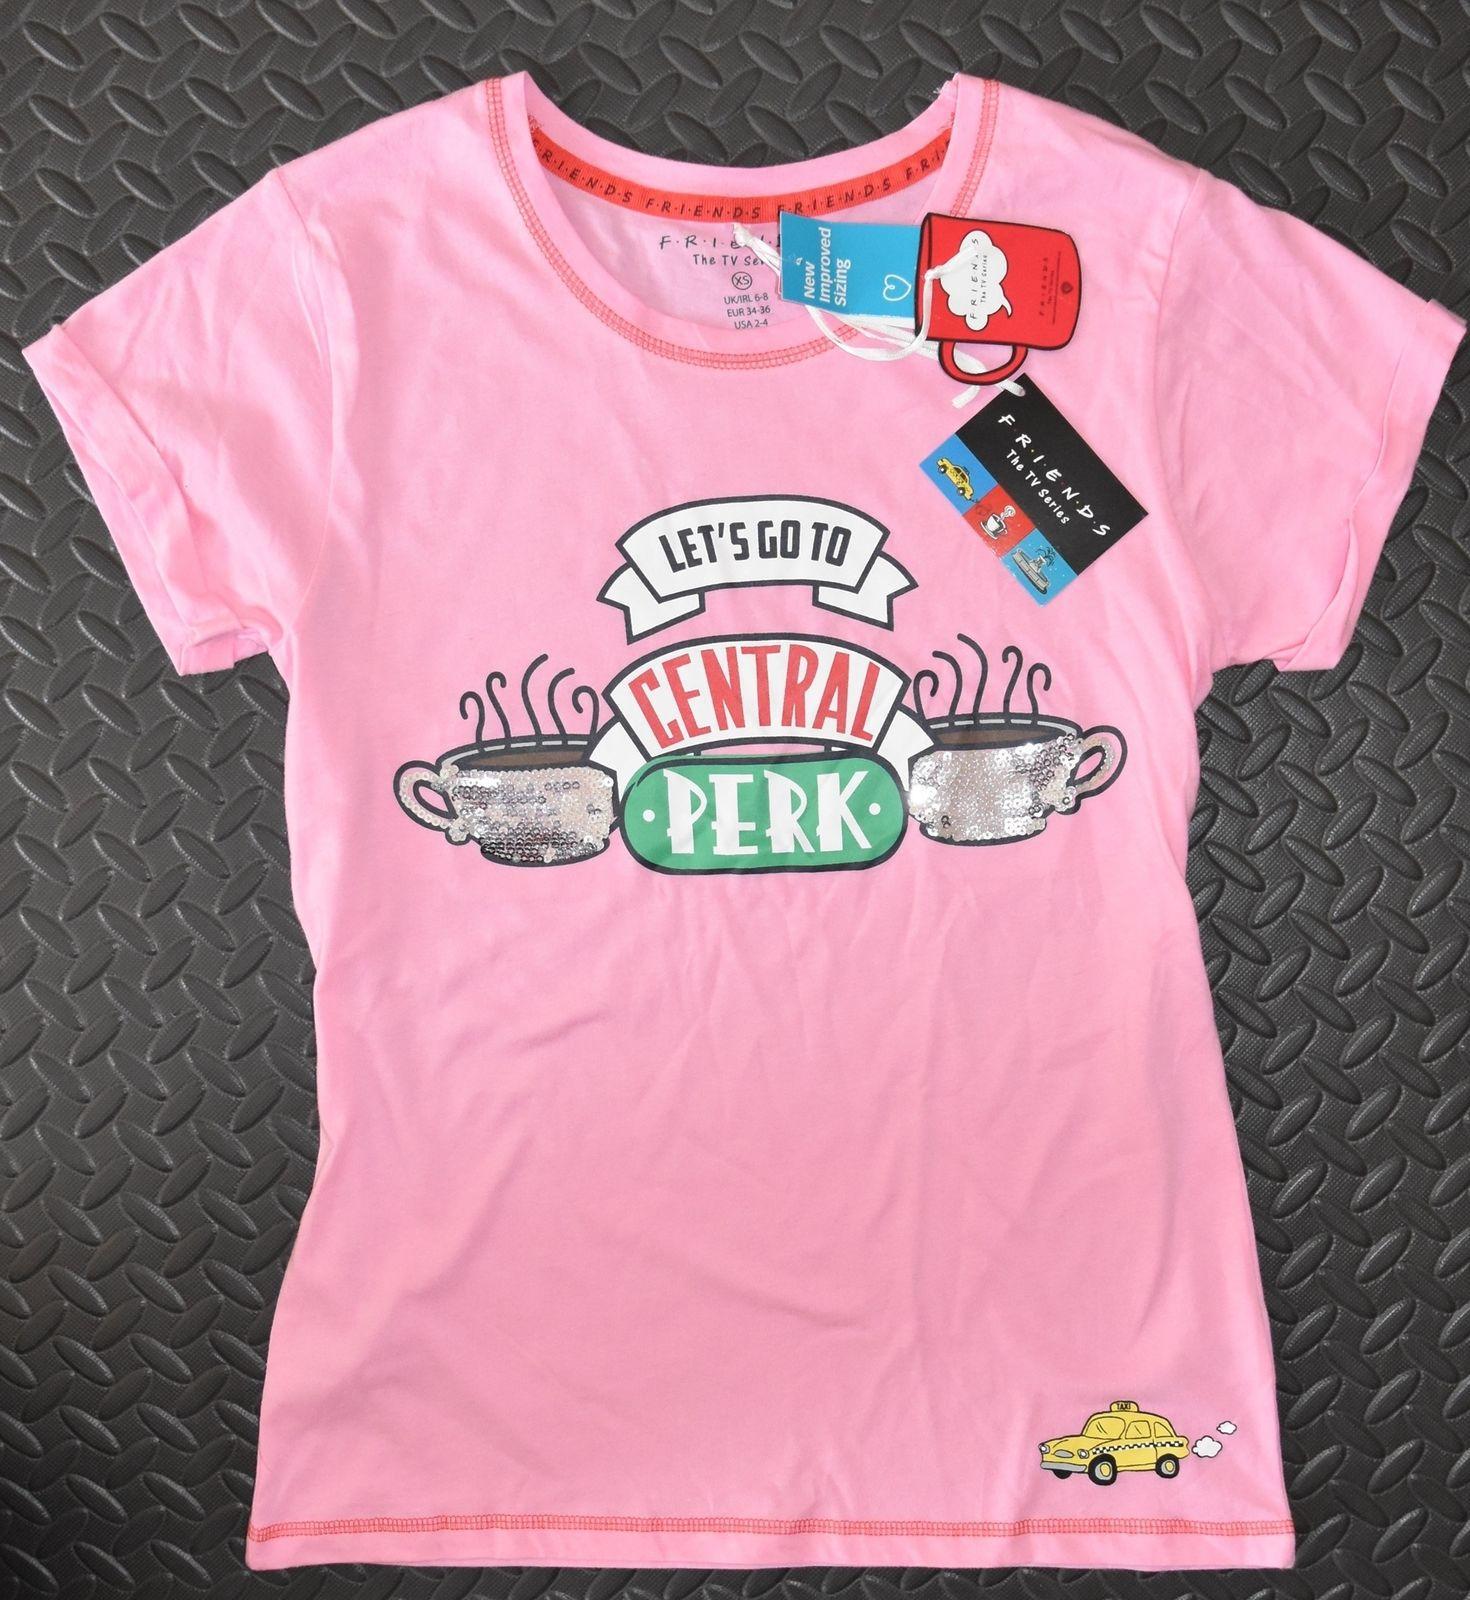 0f685217275639 Friends Primark Pj T Shirt Loose Fit Central Perk Sequin Womens Ladies Uk  Sizes Cool Casual Pride T Shirt Men Unisex Tee Shirt Designers Funny Print  T ...